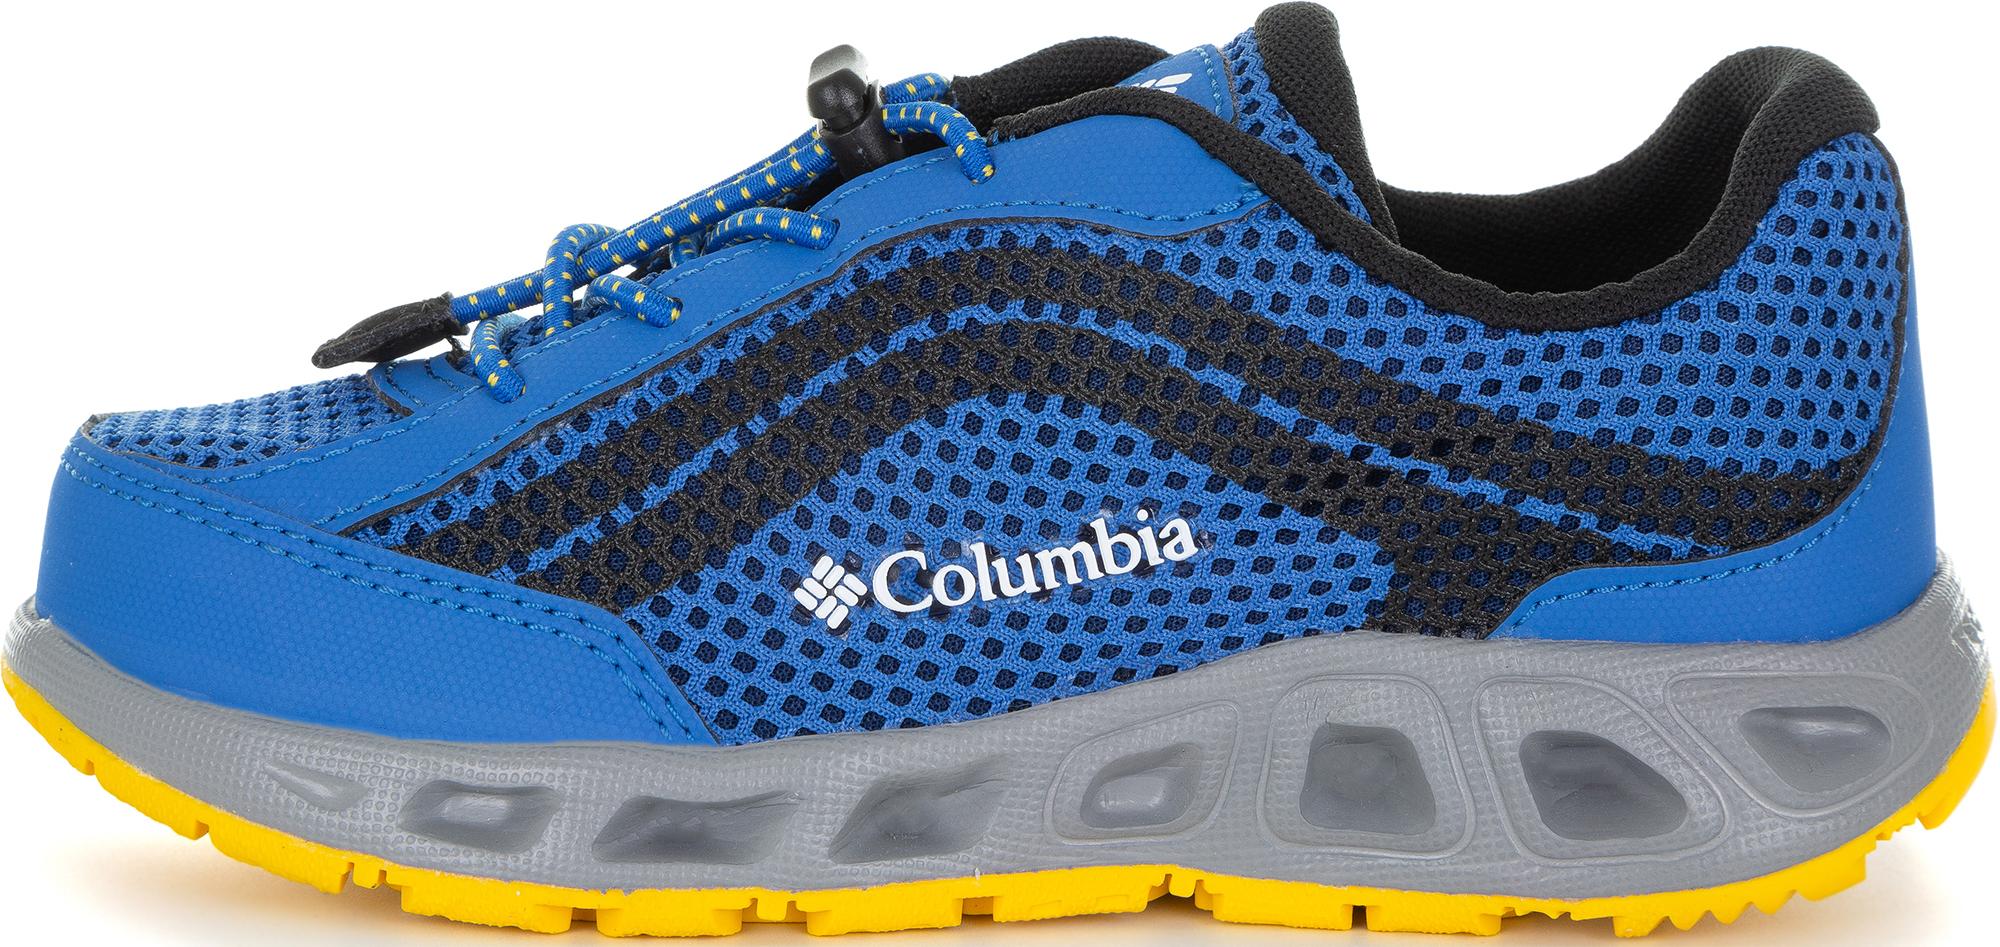 Columbia Полуботинки для мальчиков Columbia Youth Drainmaker IV, размер 37.5 полуботинки детские для мальчиков t taccardi